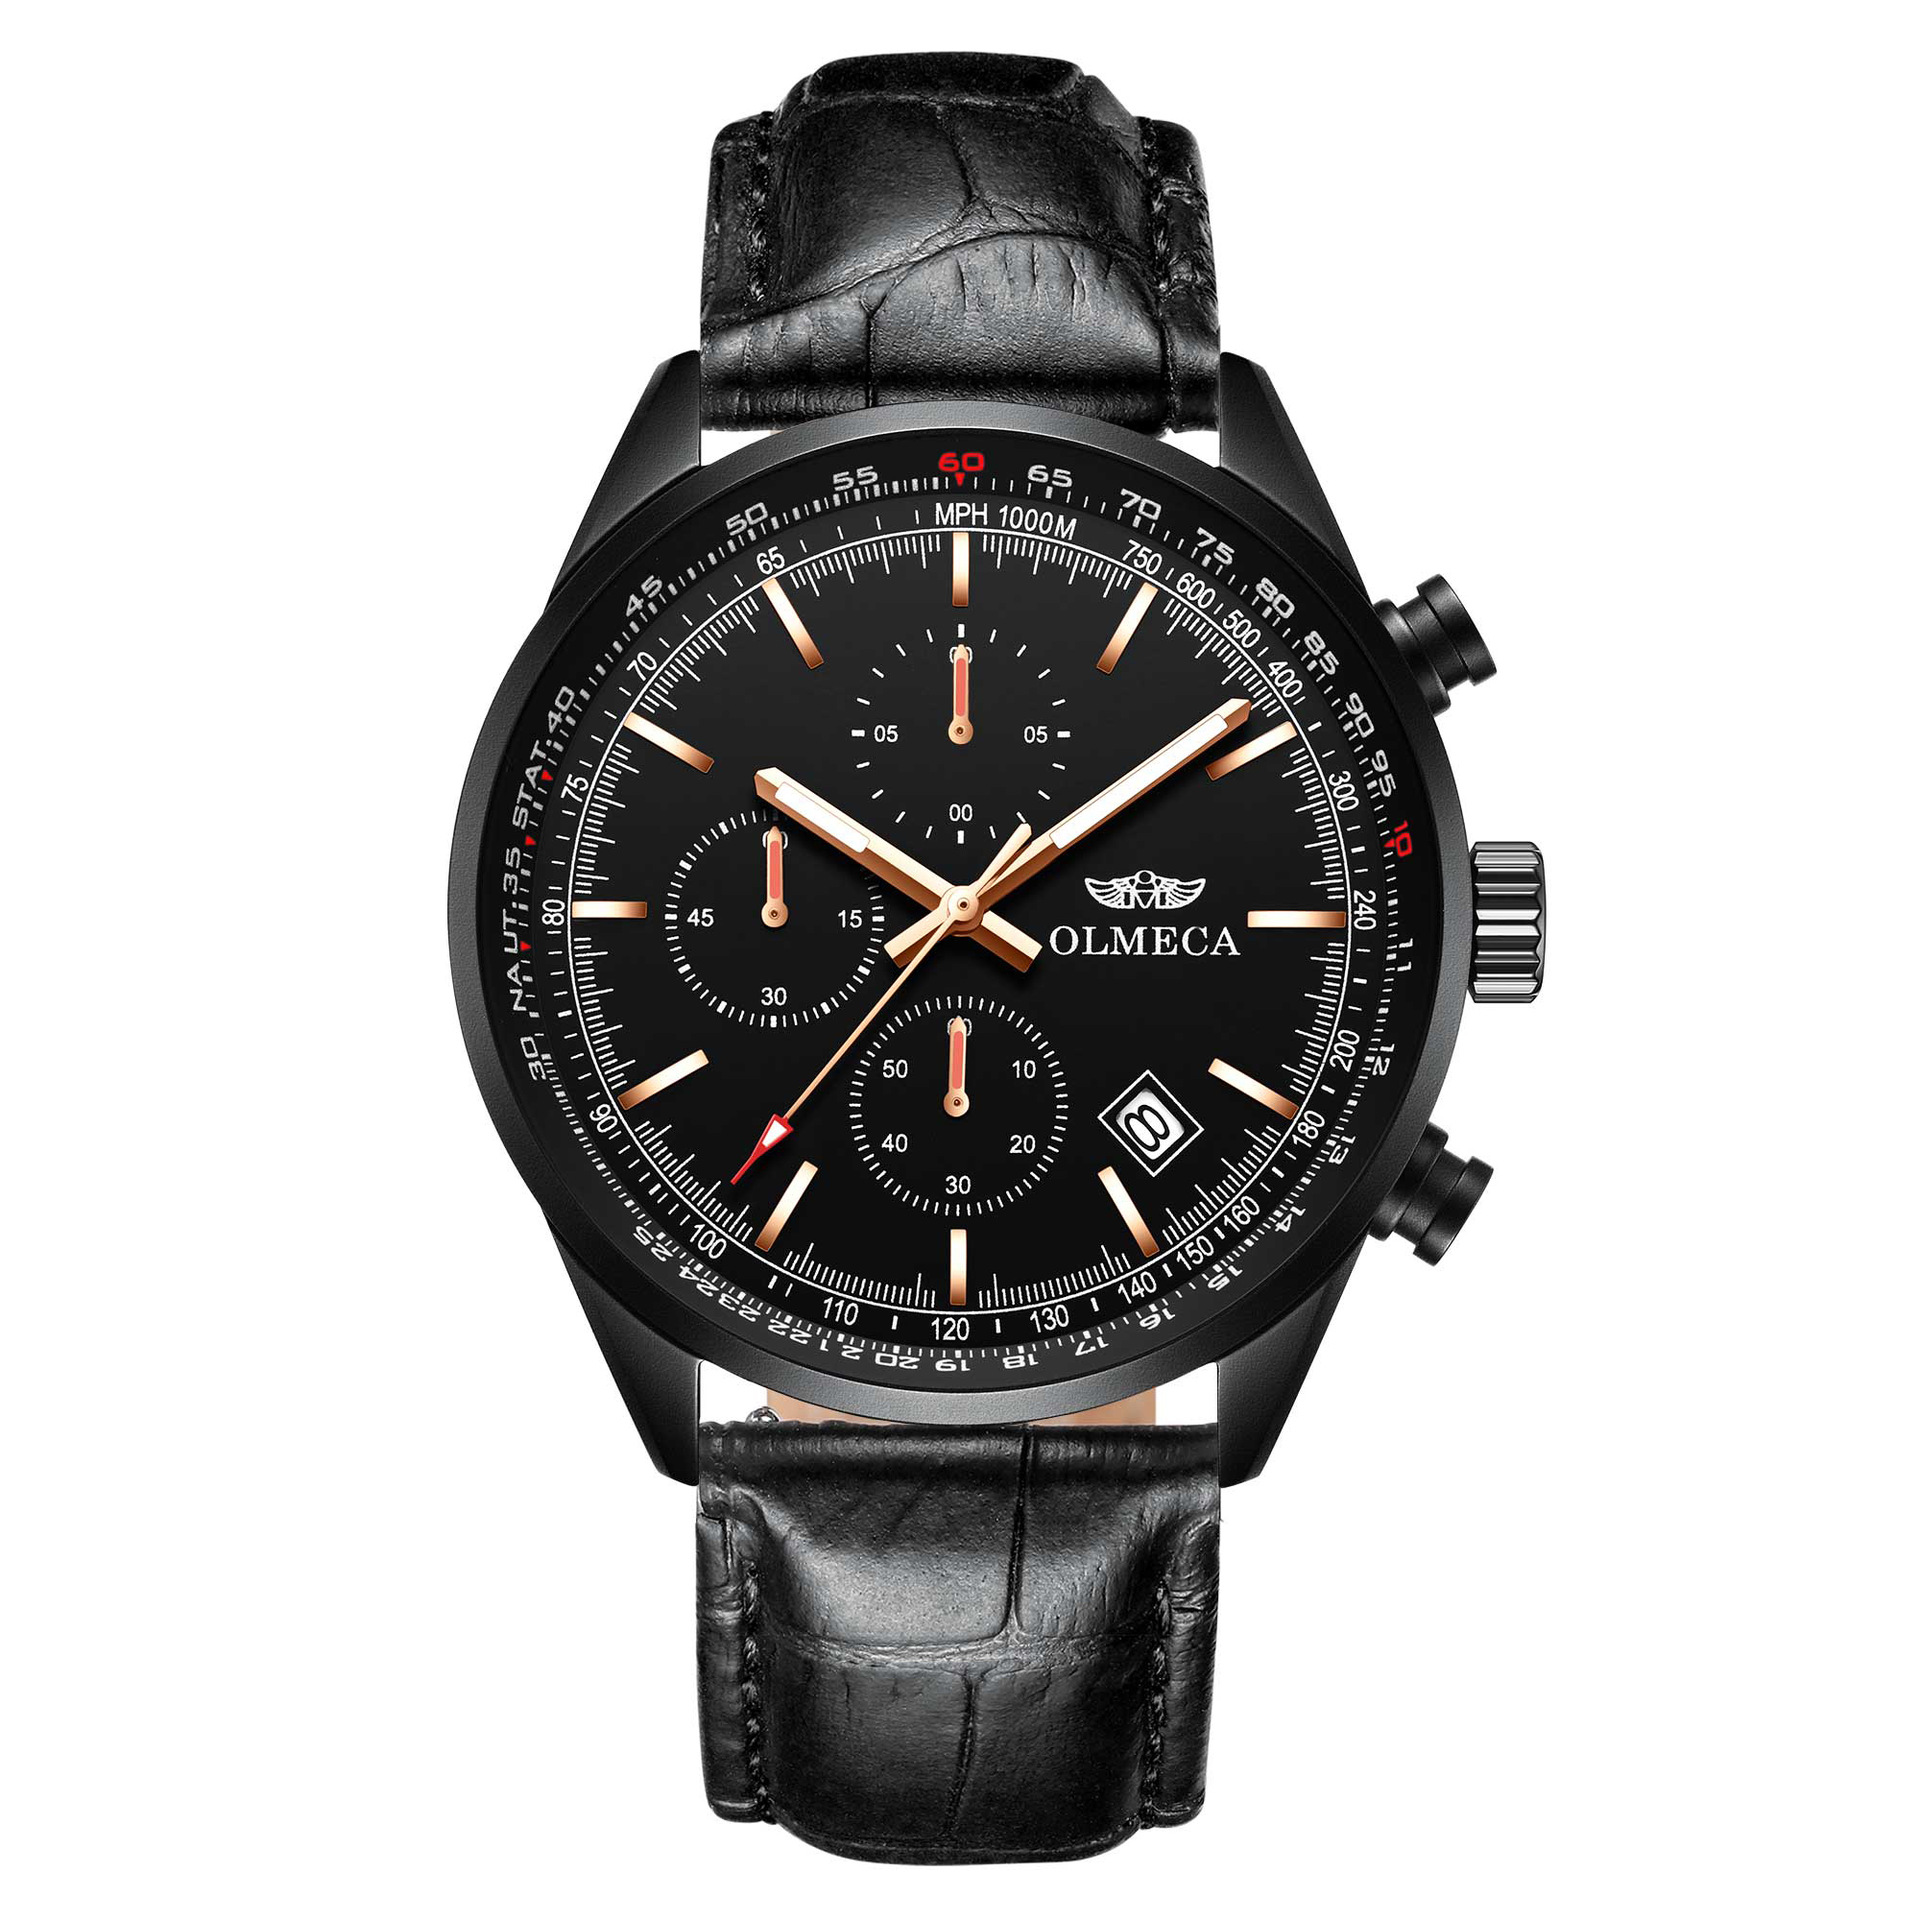 ECA锗石保健磁疗能量手表多功能运动不锈钢蓝宝石高档男士手表C09